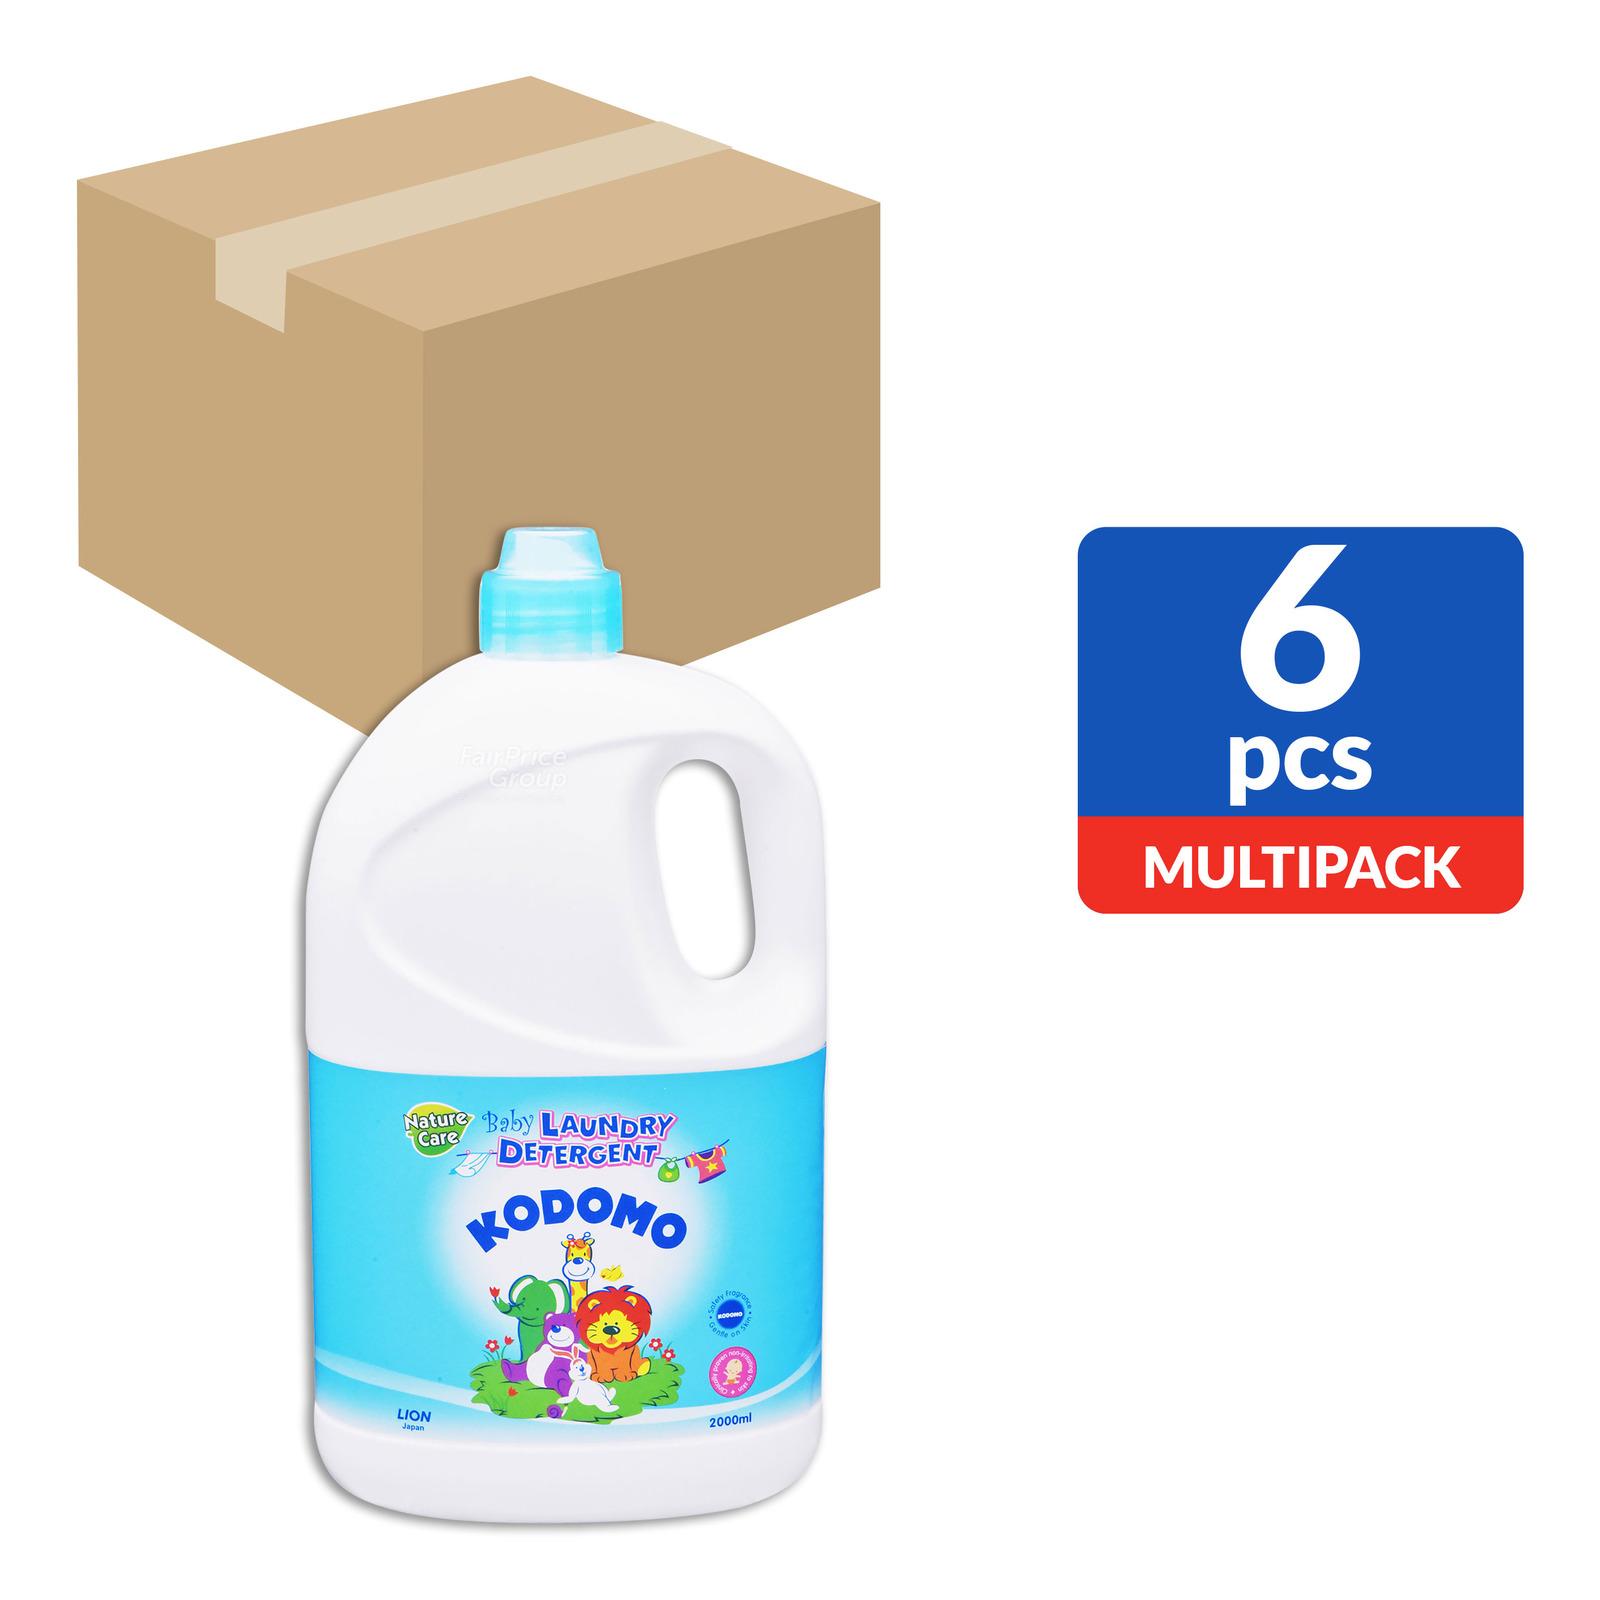 Kodomo Baby Laundry Detergent - Nature Care